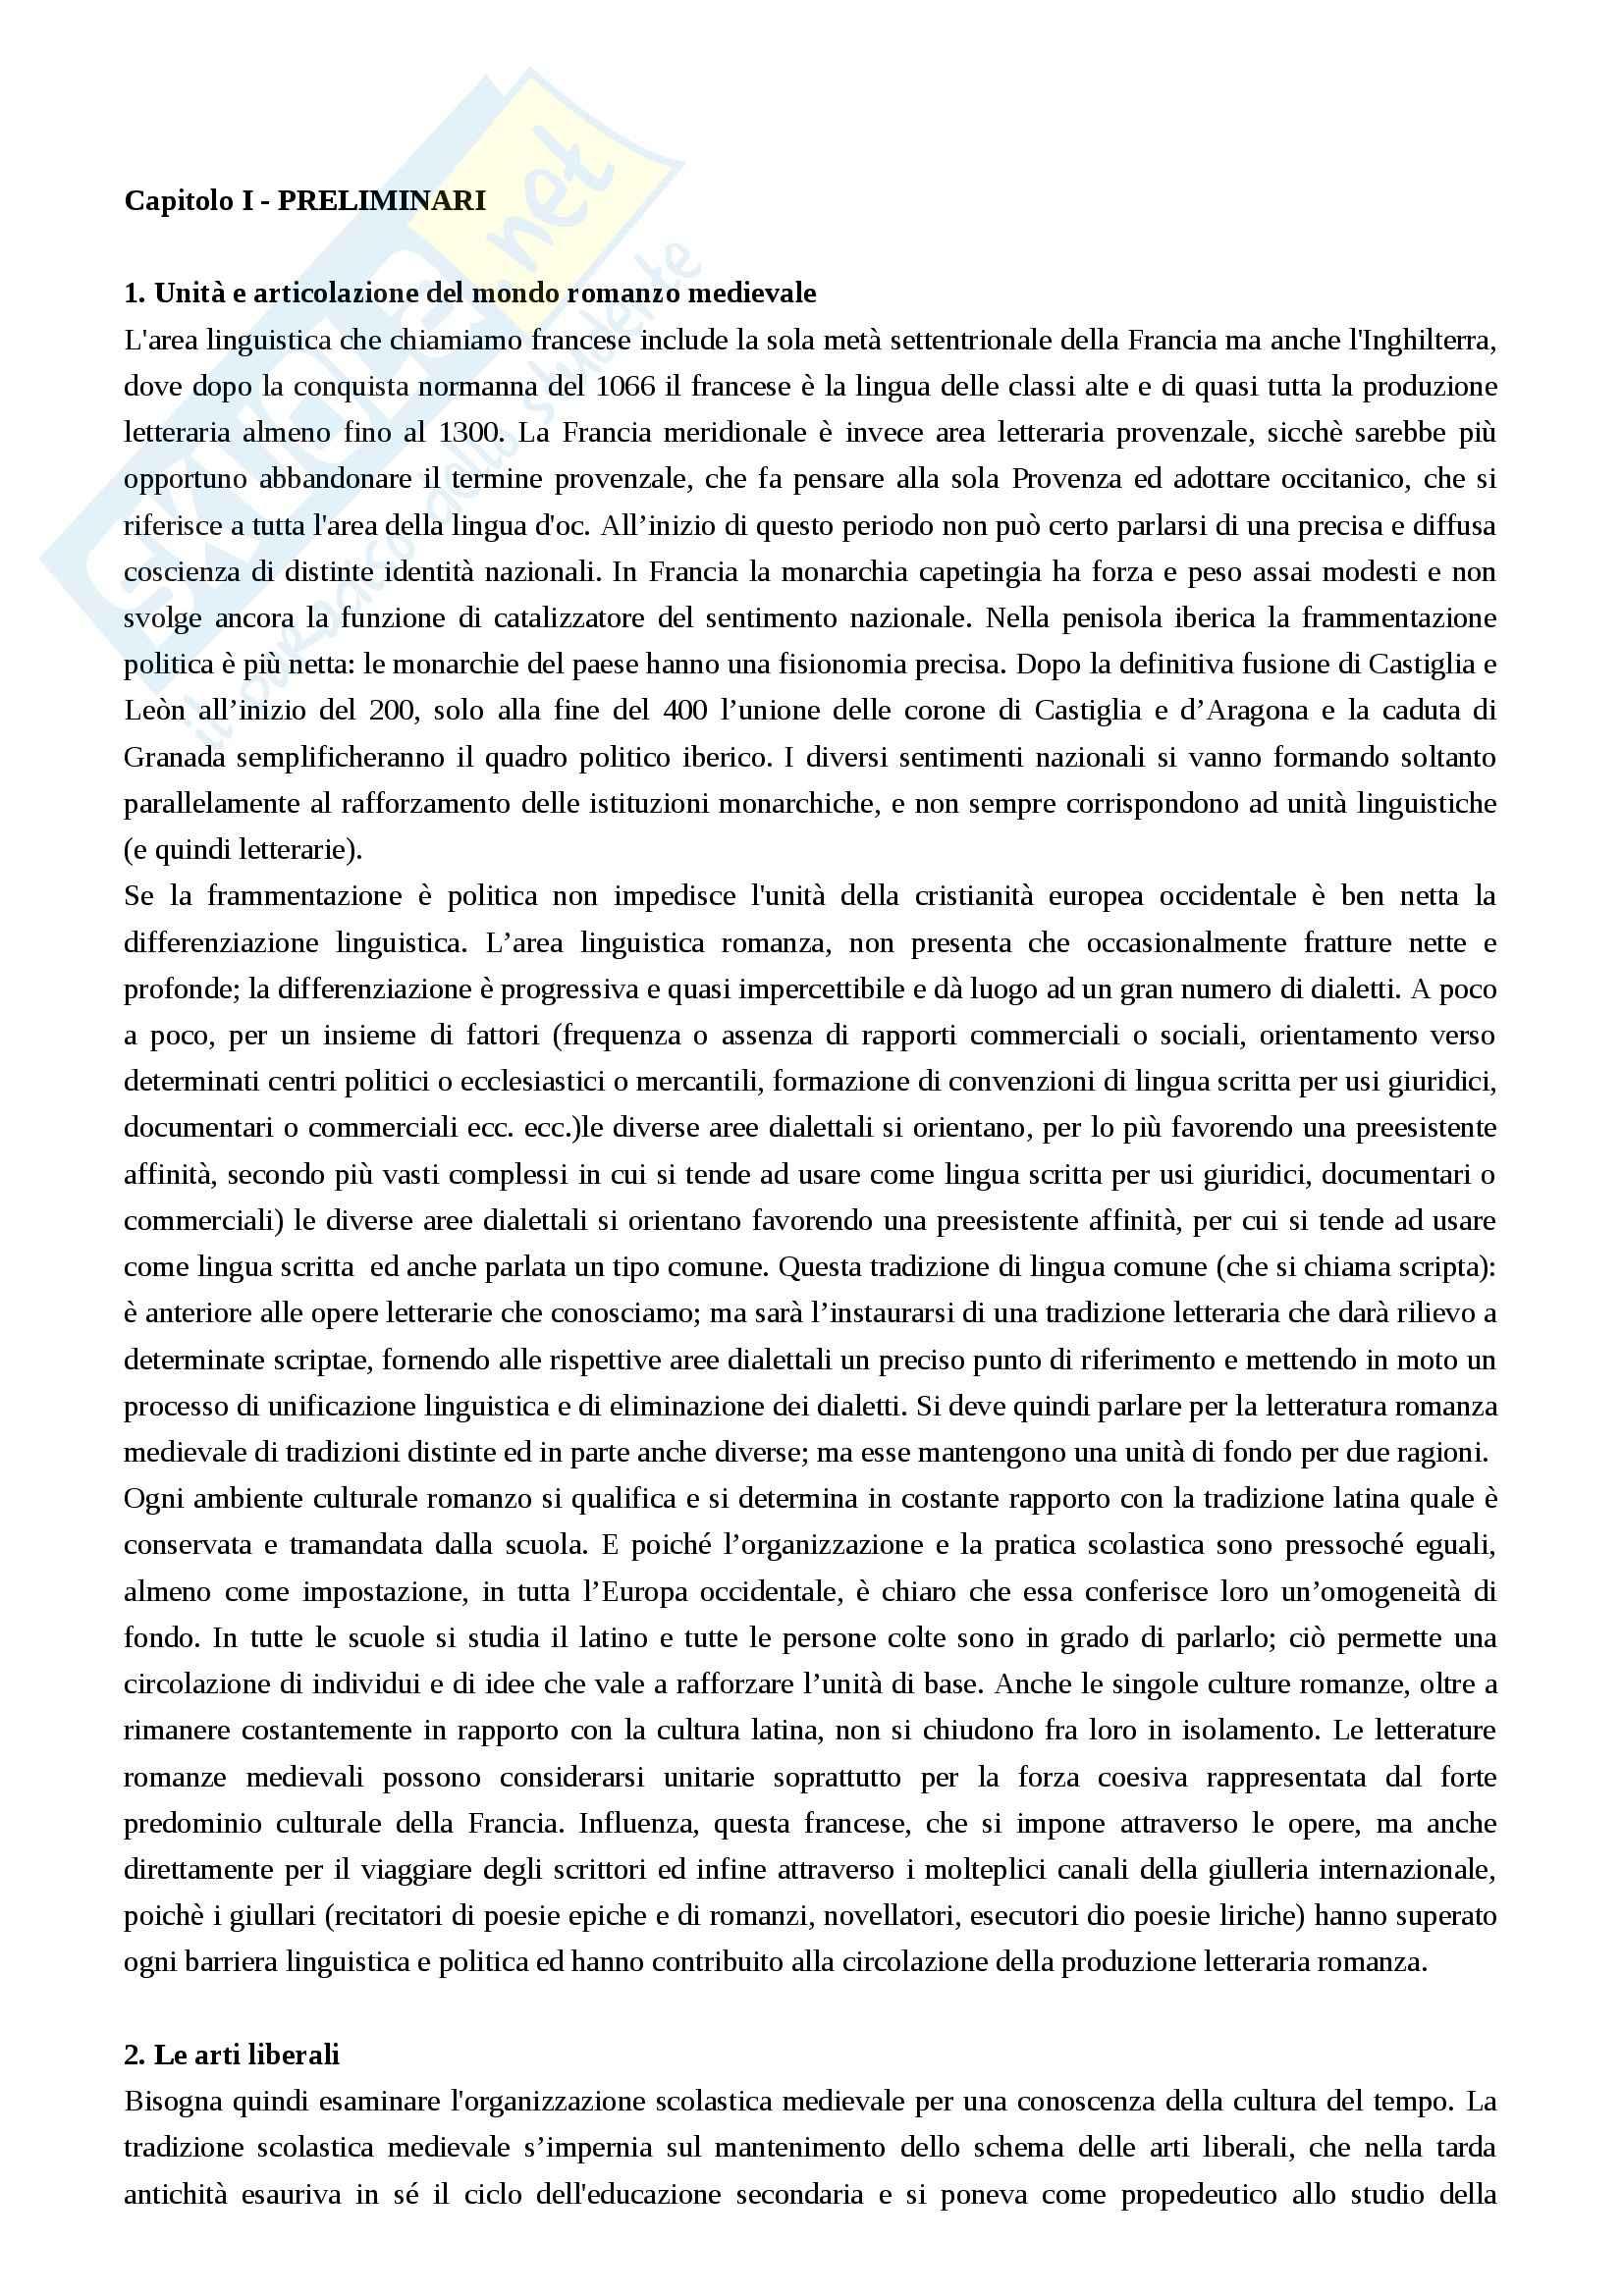 appunto S. Luongo Filologia romanza